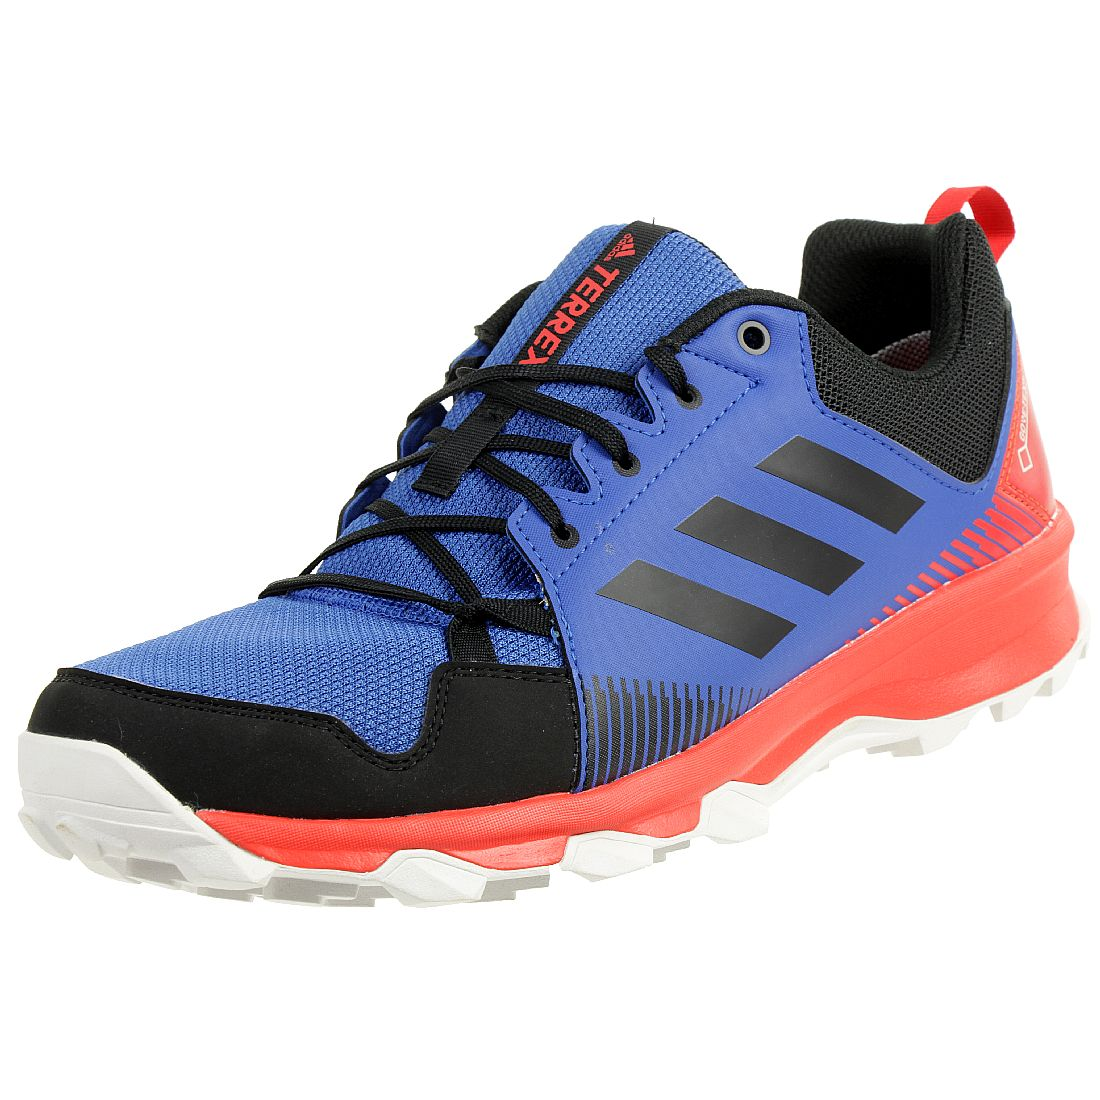 Adidas Herren Terrex Tracerocker GTX Trailrunning Schuh